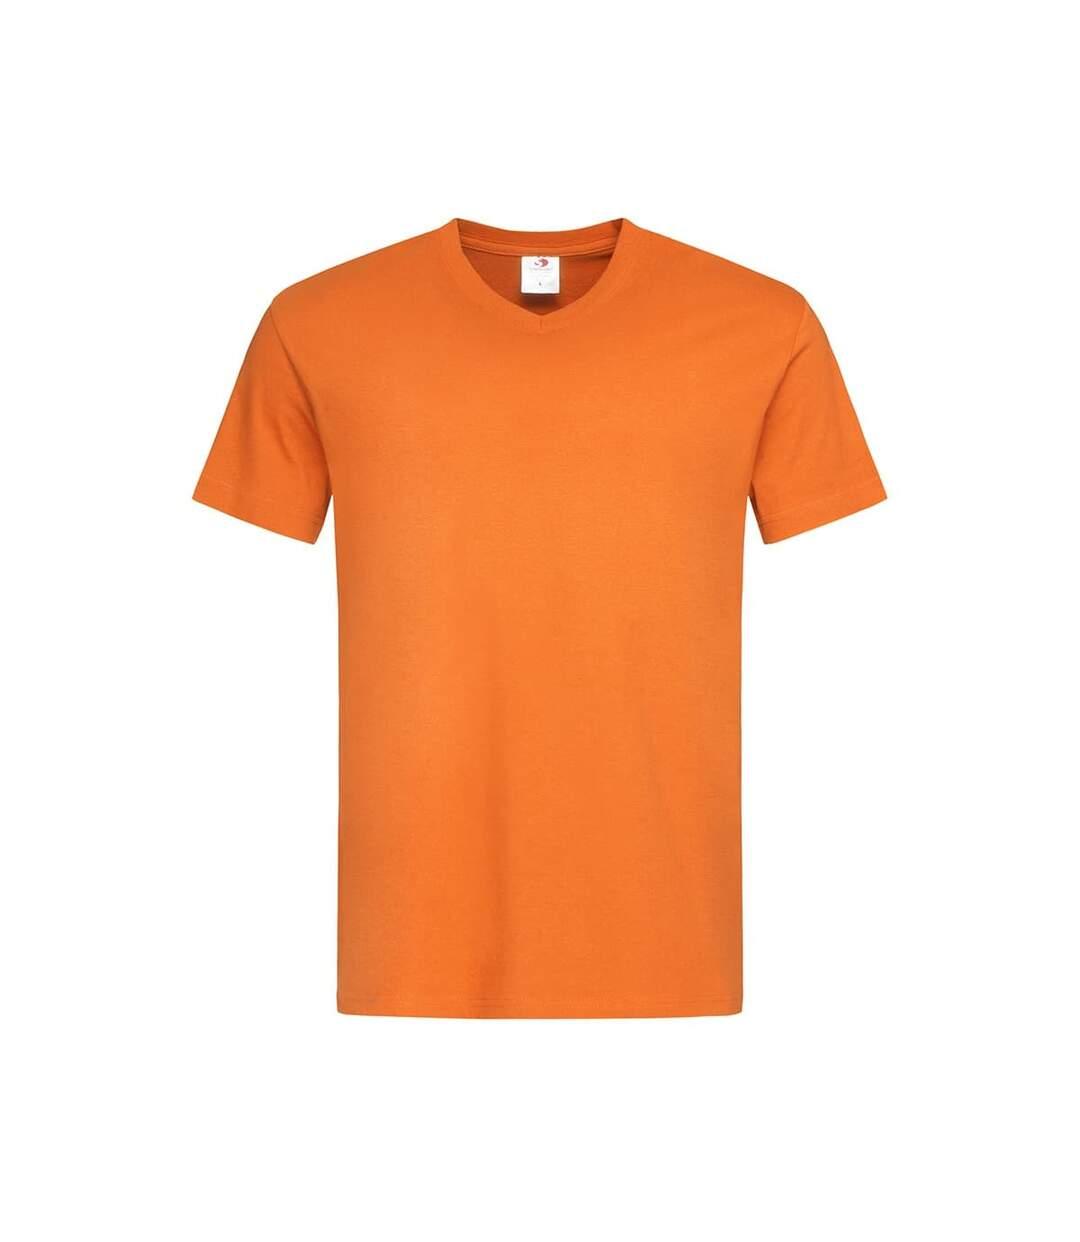 Stedman Mens Classic V Neck Tee (Orange) - UTAB276